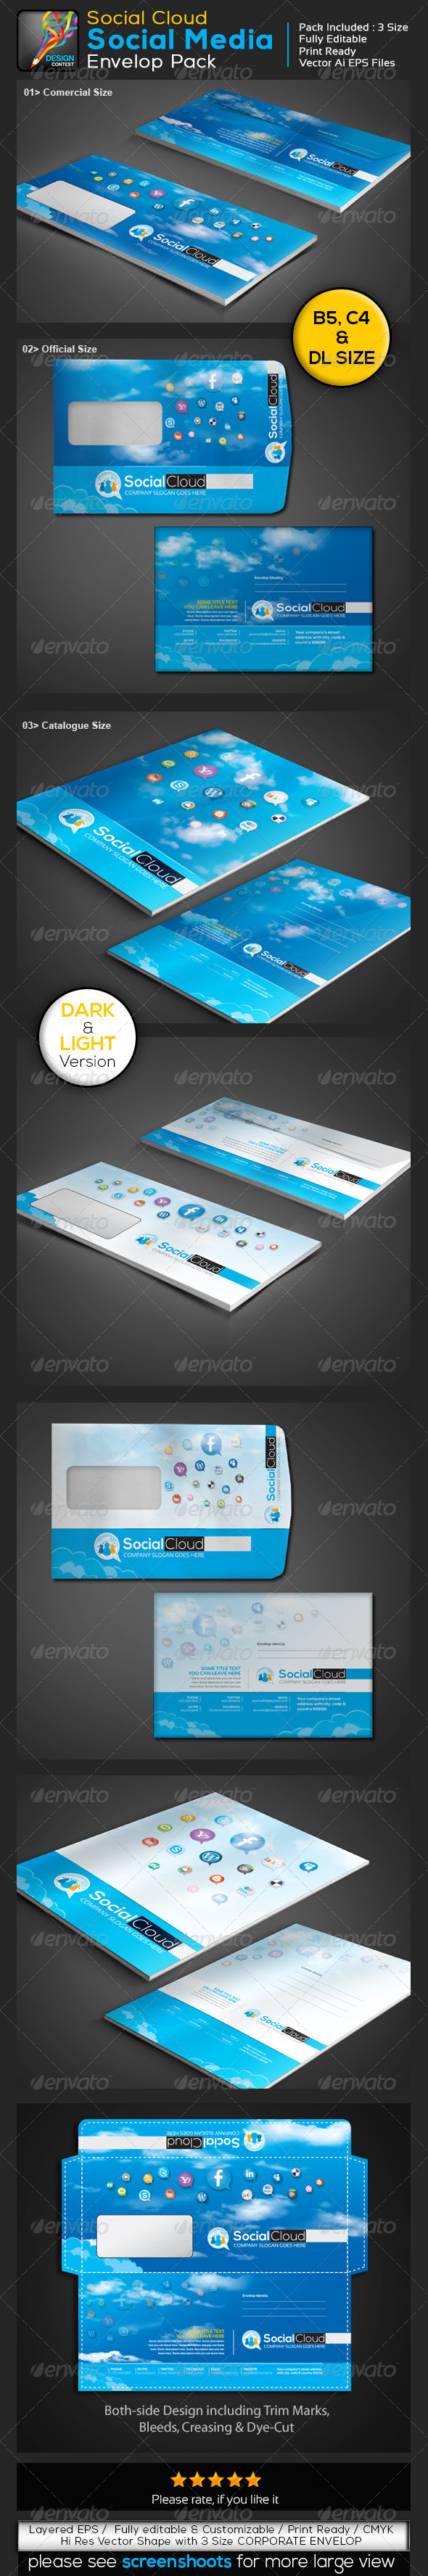 Social Cloud Social Media 3 Size Envelop Pack